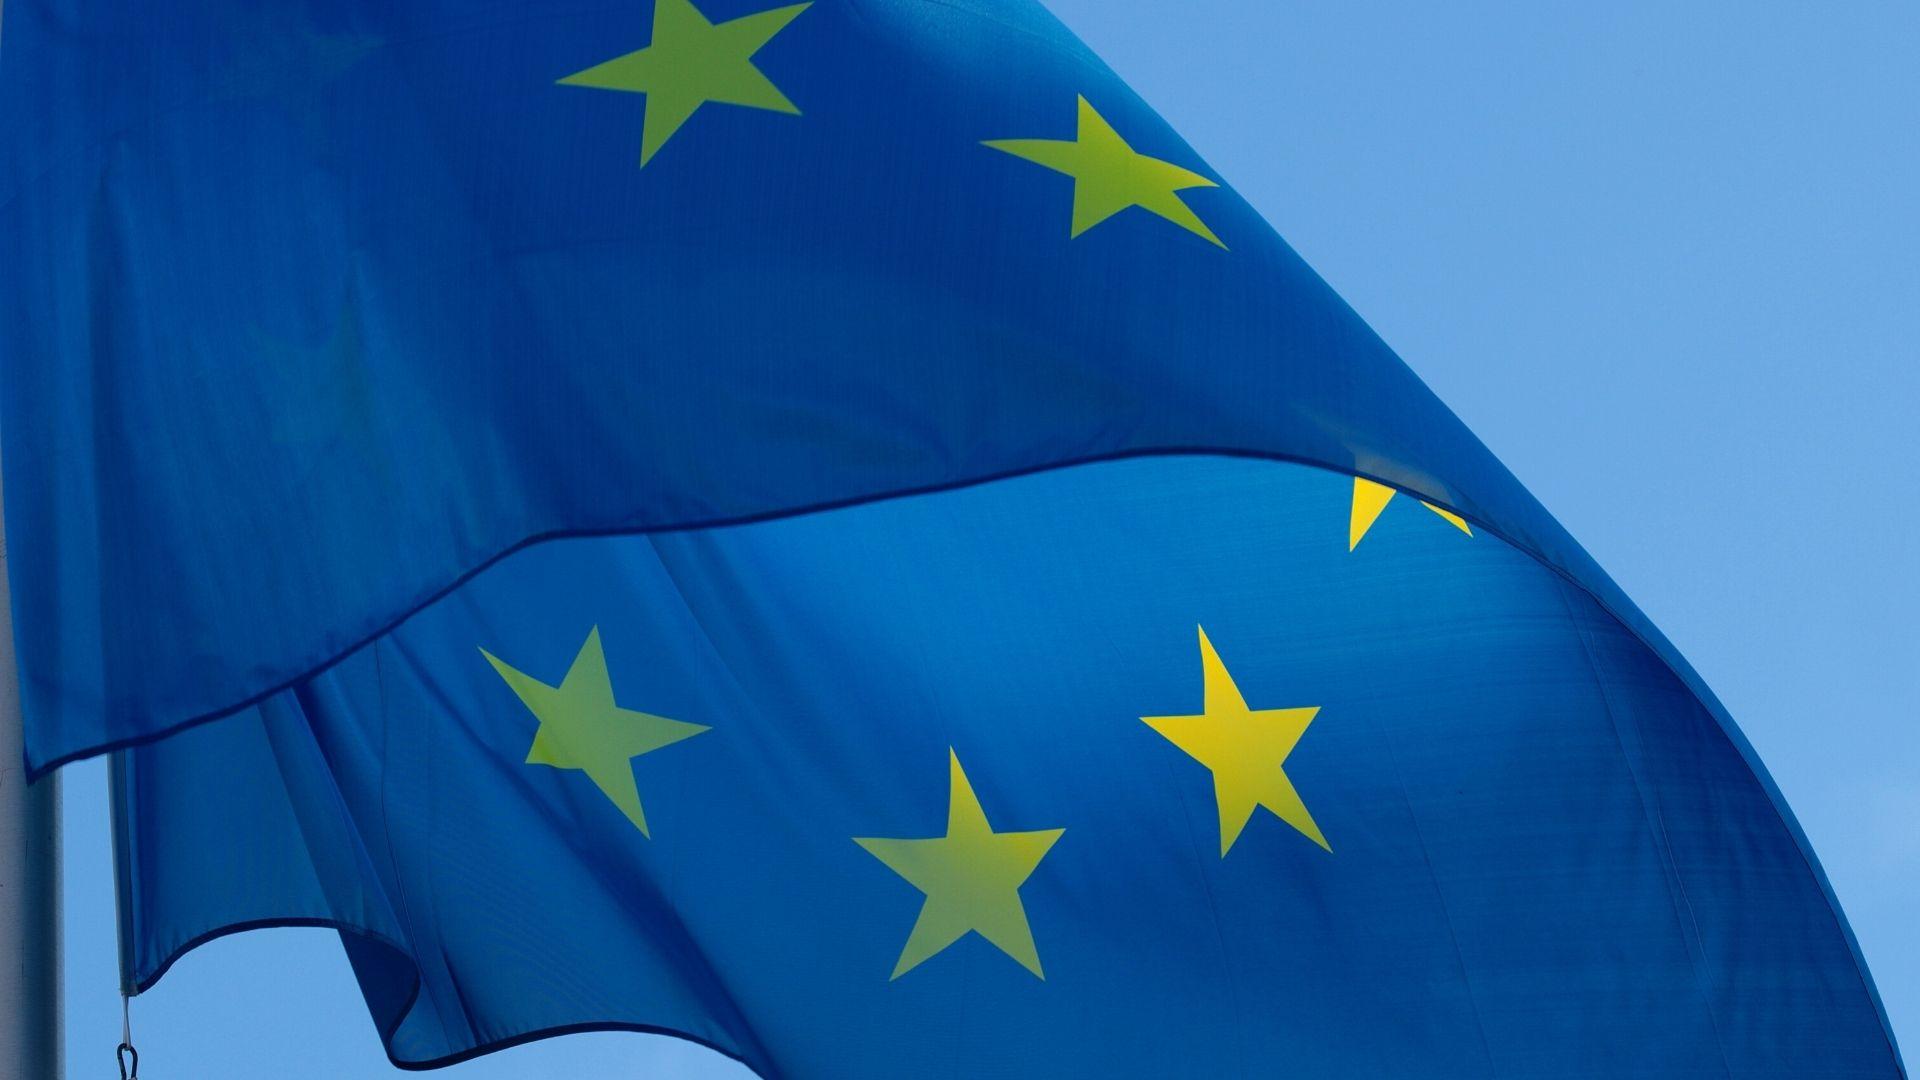 Corte Giustizia Europea v2